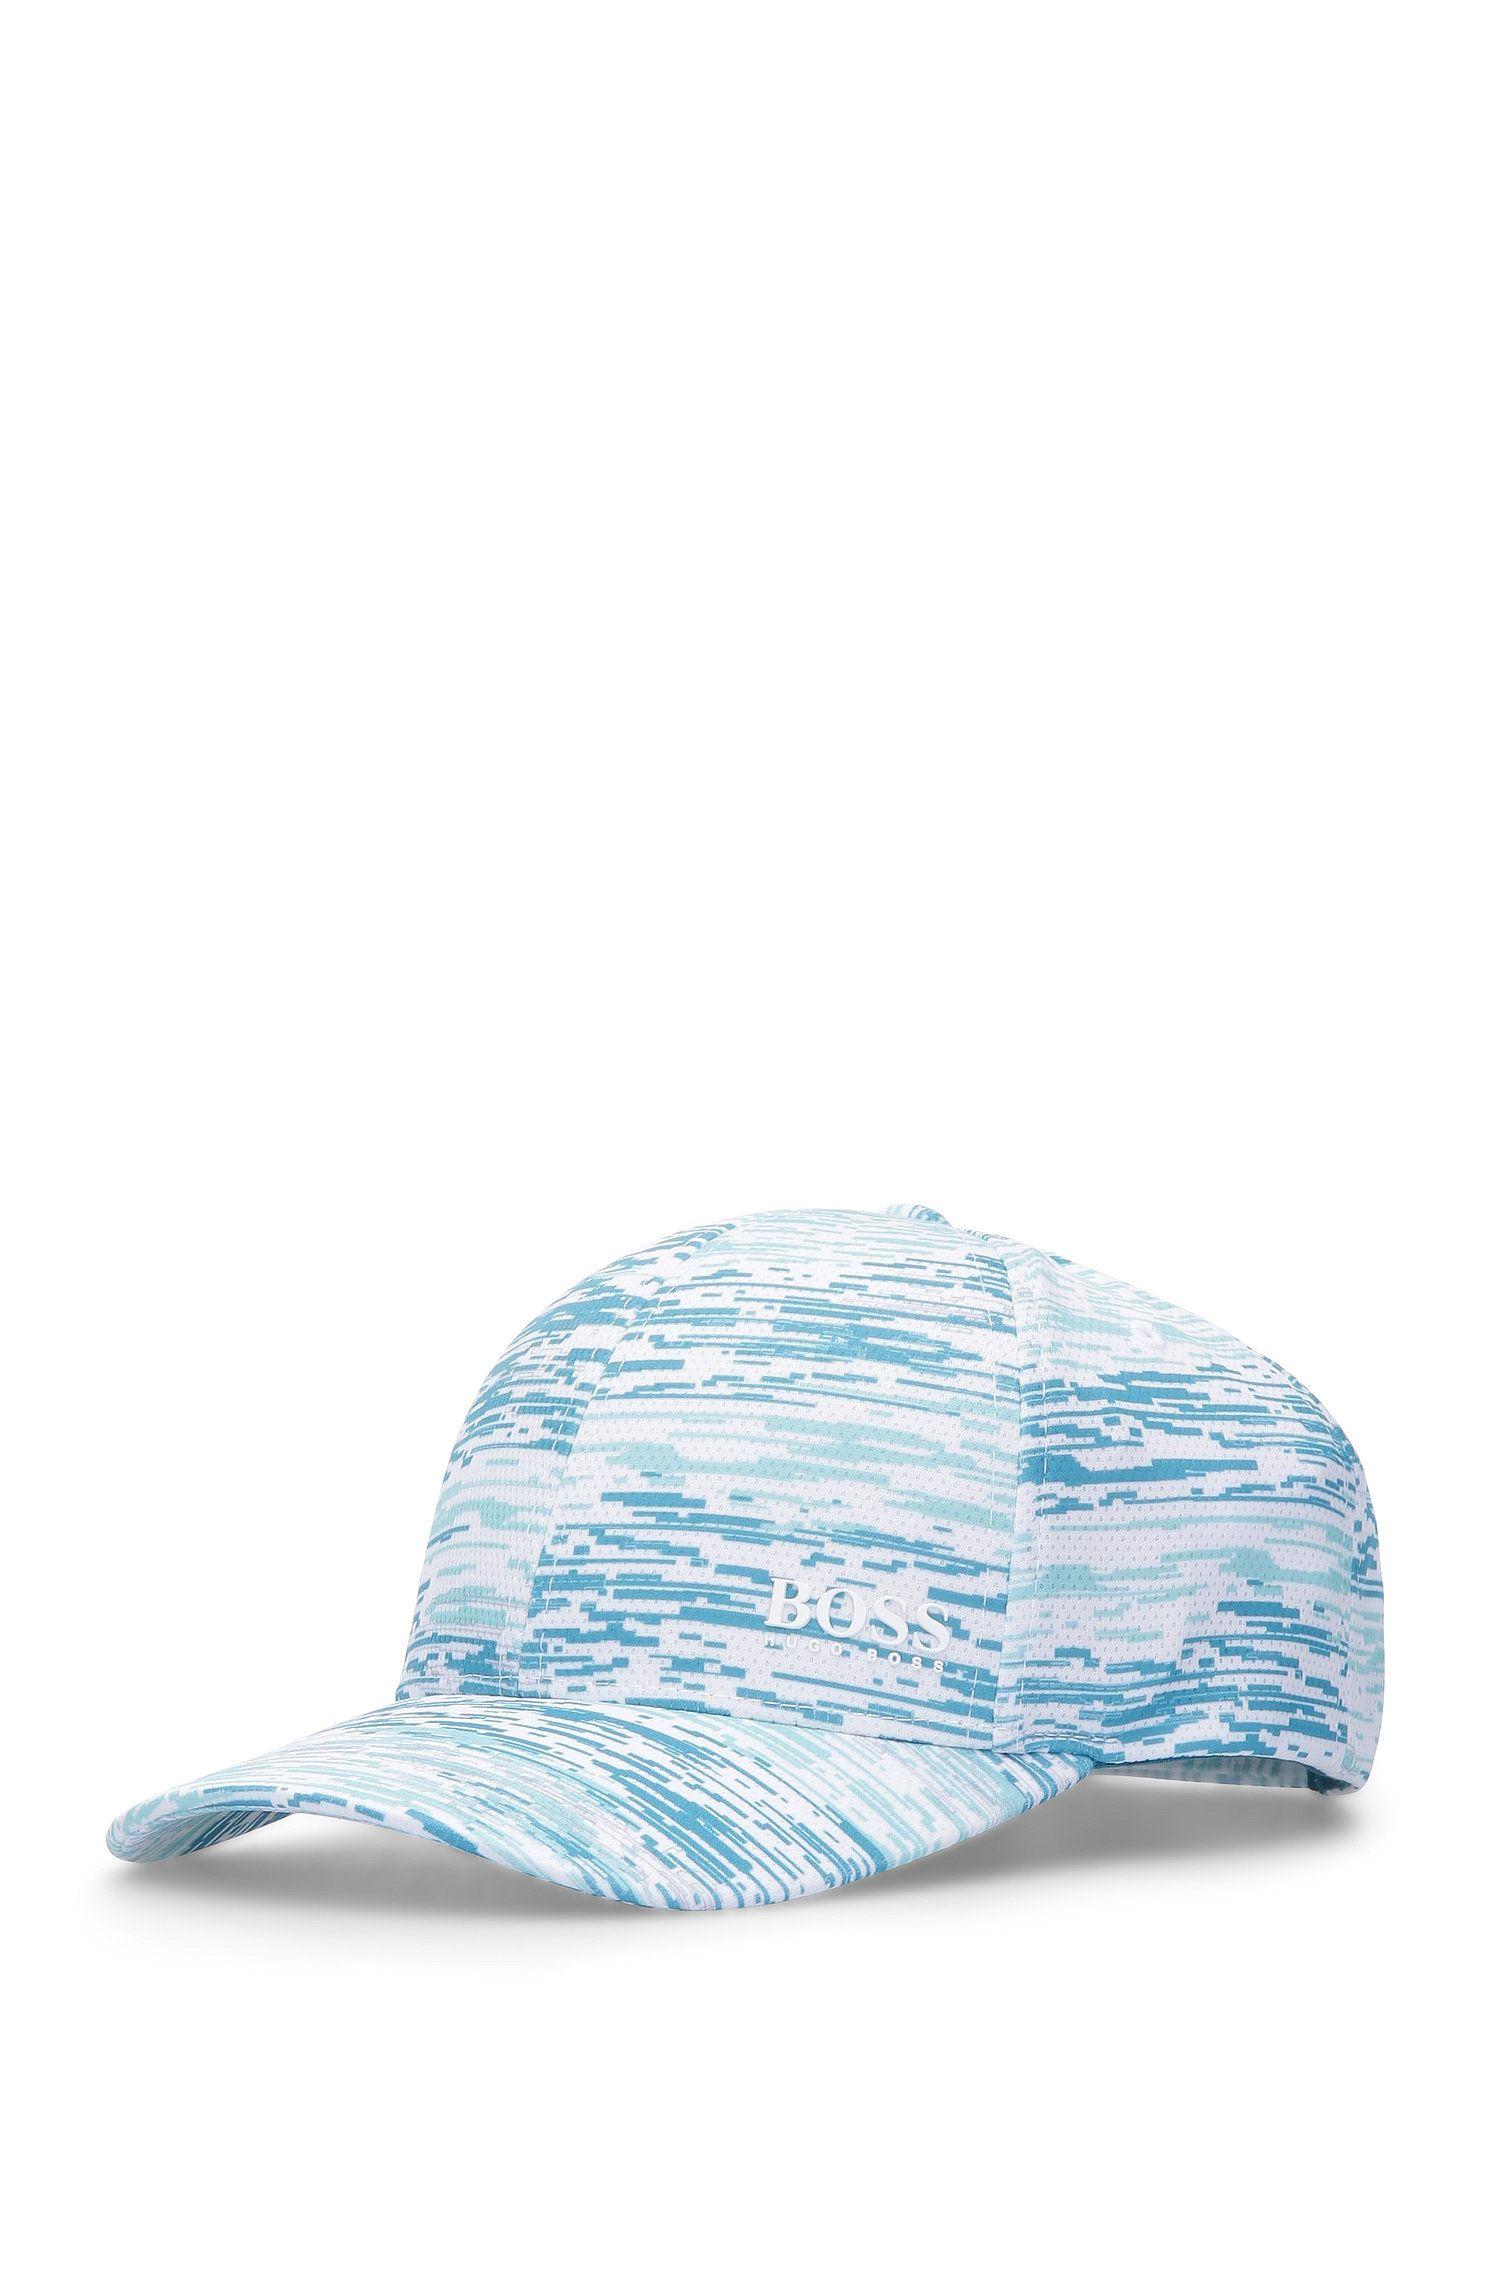 'Printcap' | Baseball Cap with Pattern